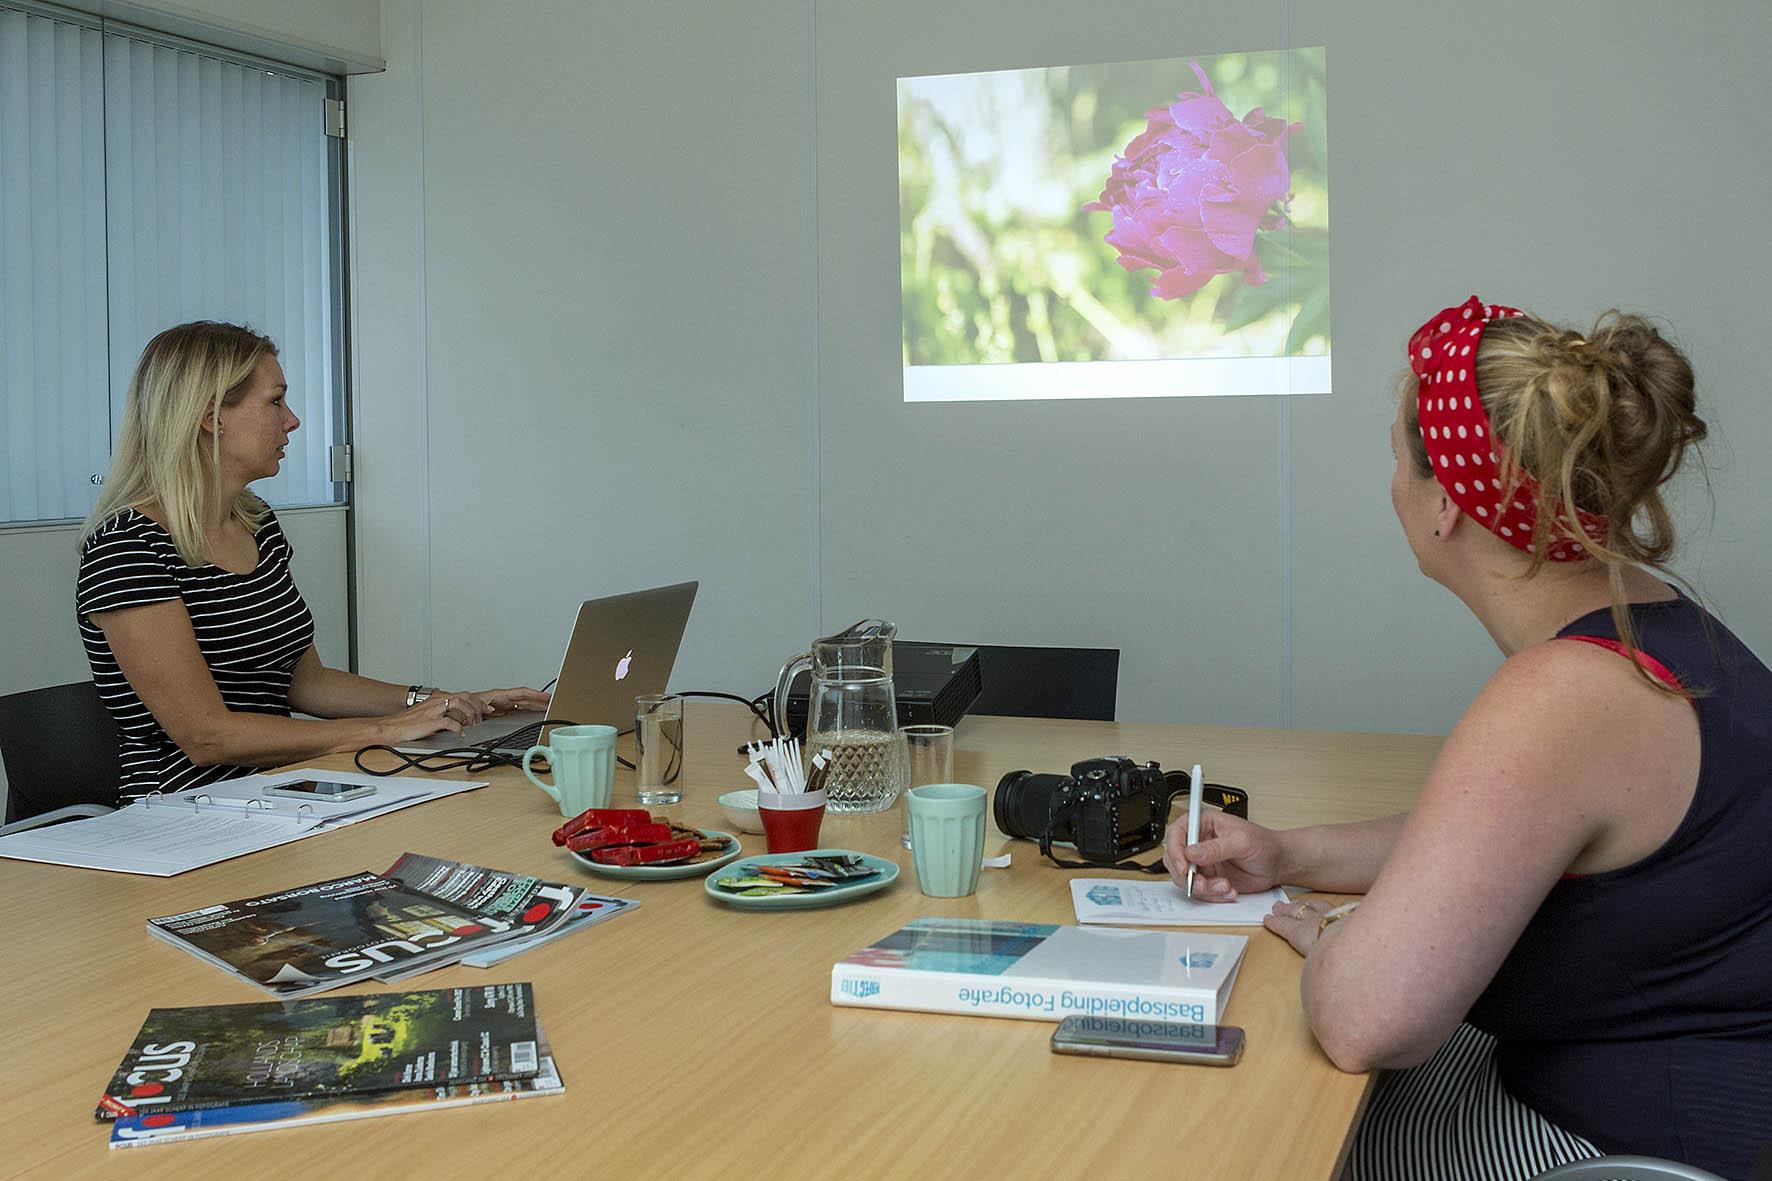 prive-cursus fotografie Fotografiecursus-Helmond